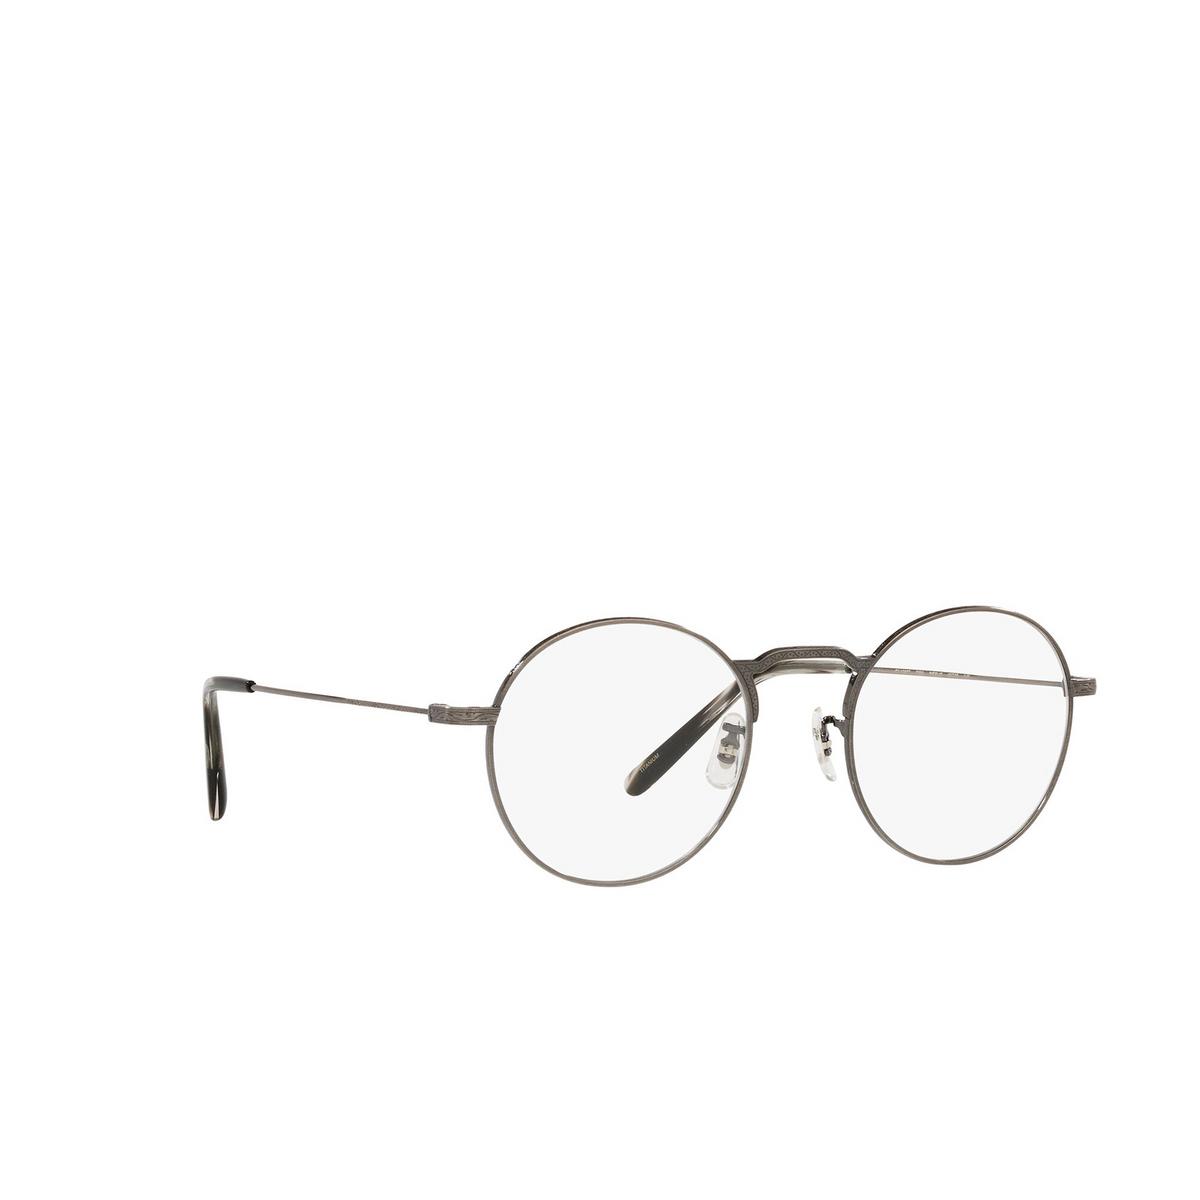 Oliver Peoples® Round Eyeglasses: Weslie OV1282T color Antique Pewter 5289 - three-quarters view.